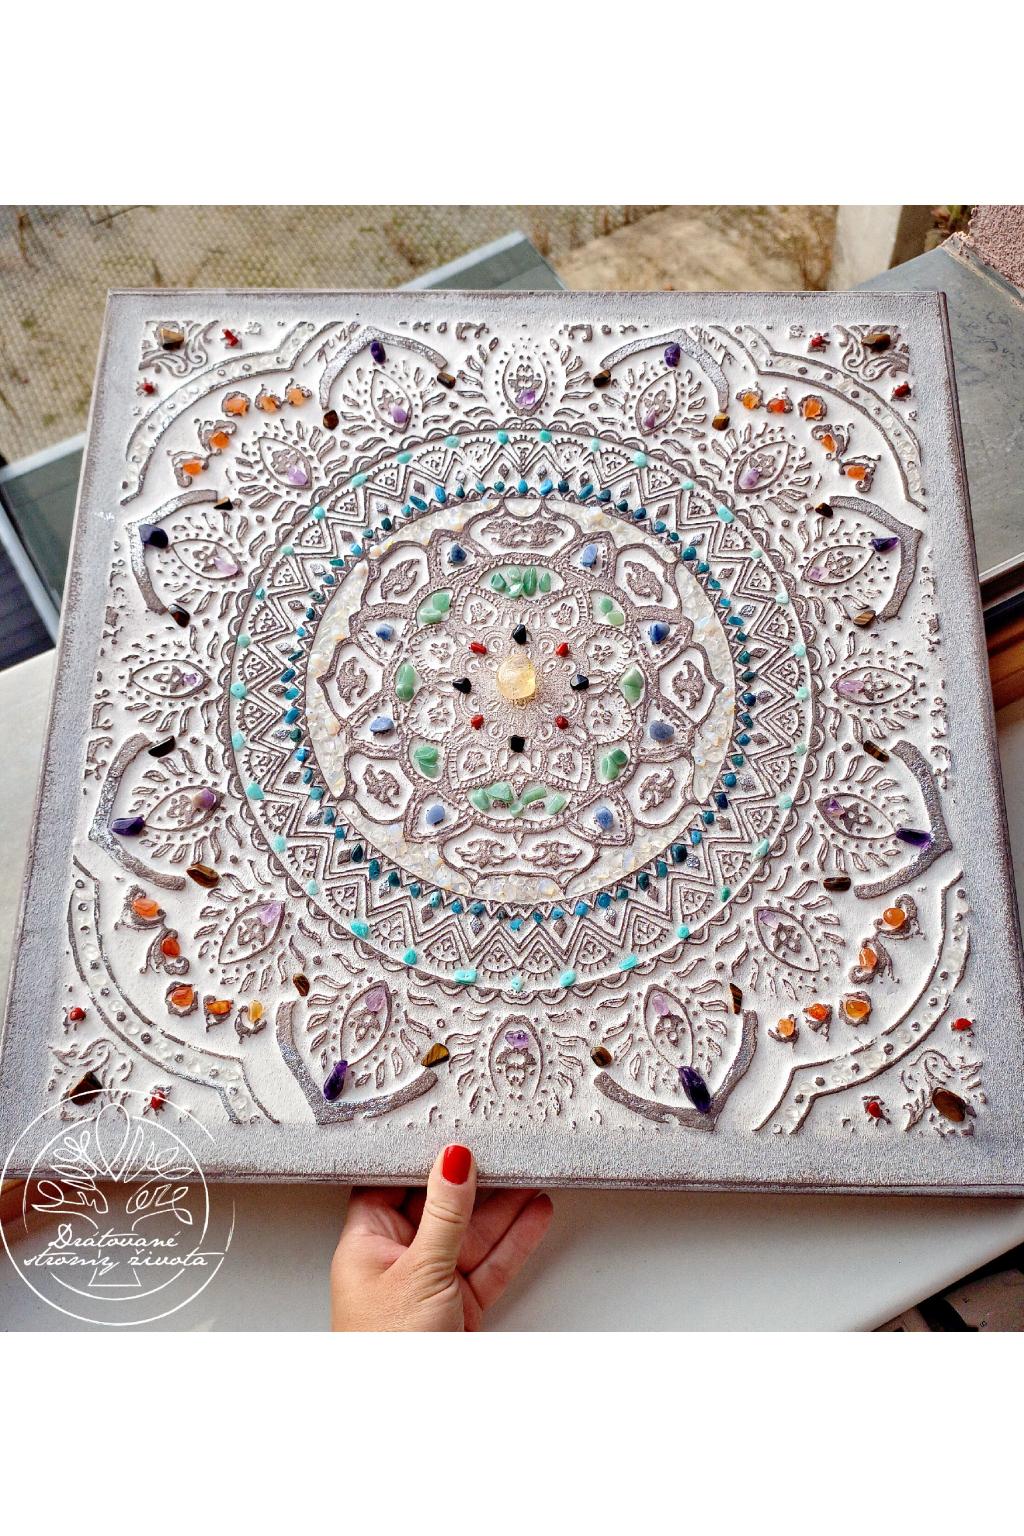 Mandala Polodrahokamy - Harmonizuji tvé čakry 50x50cm